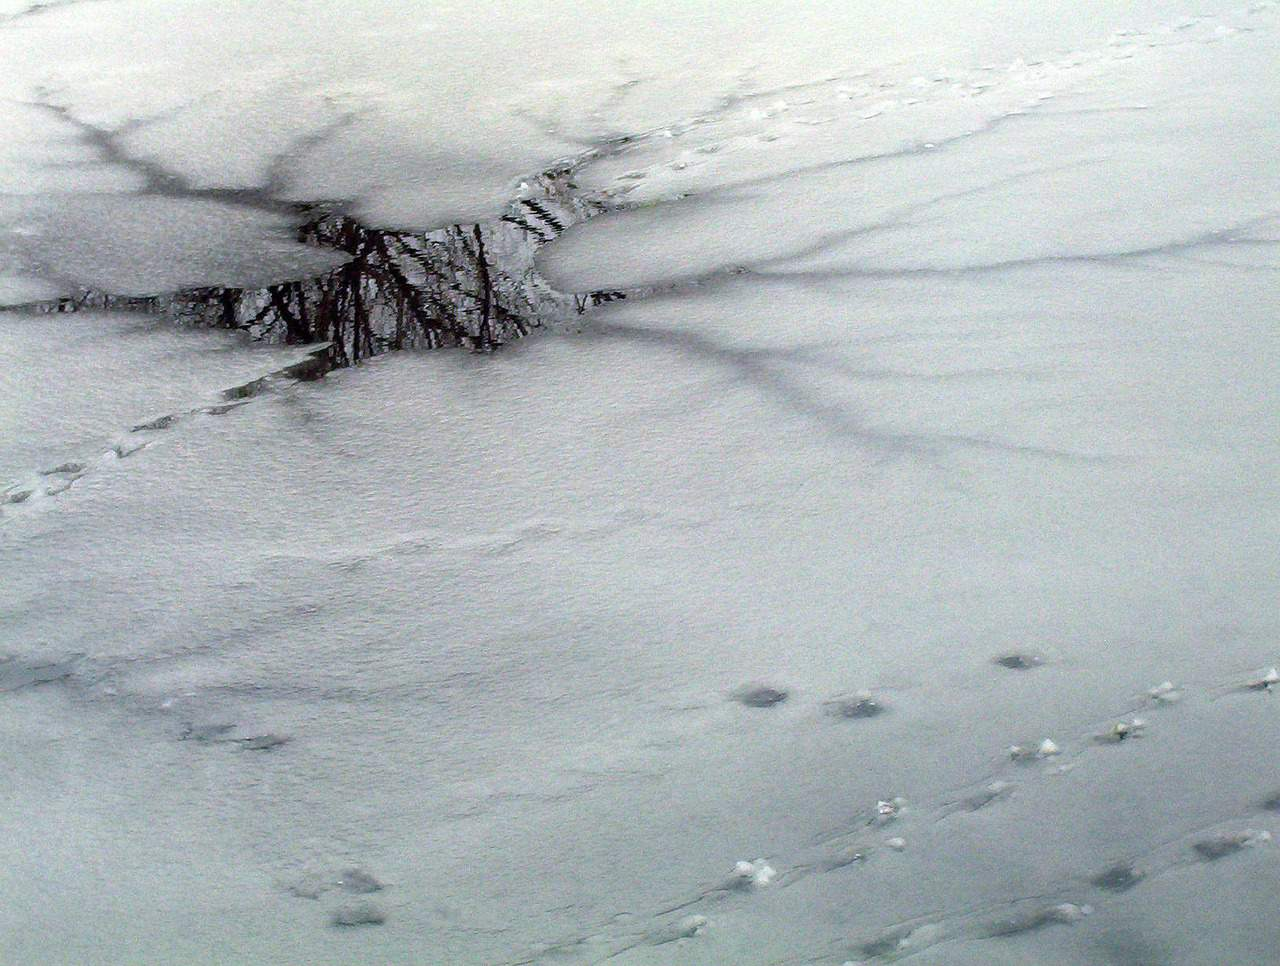 Is Google's Dragonfly Treading on Thin Ice?